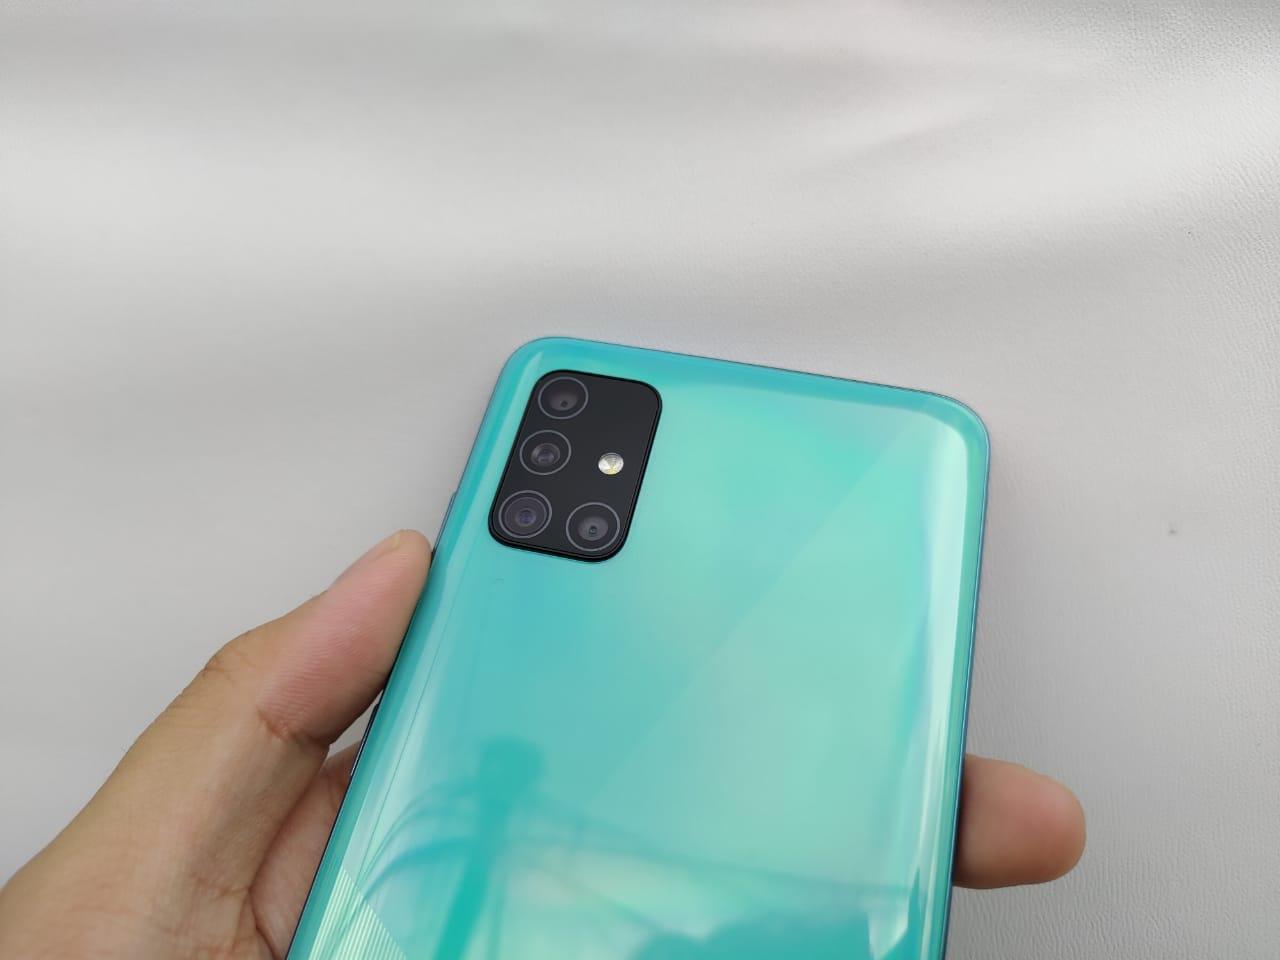 Samsung Galaxy A51, Smartphone Tipis Kamera 48MP